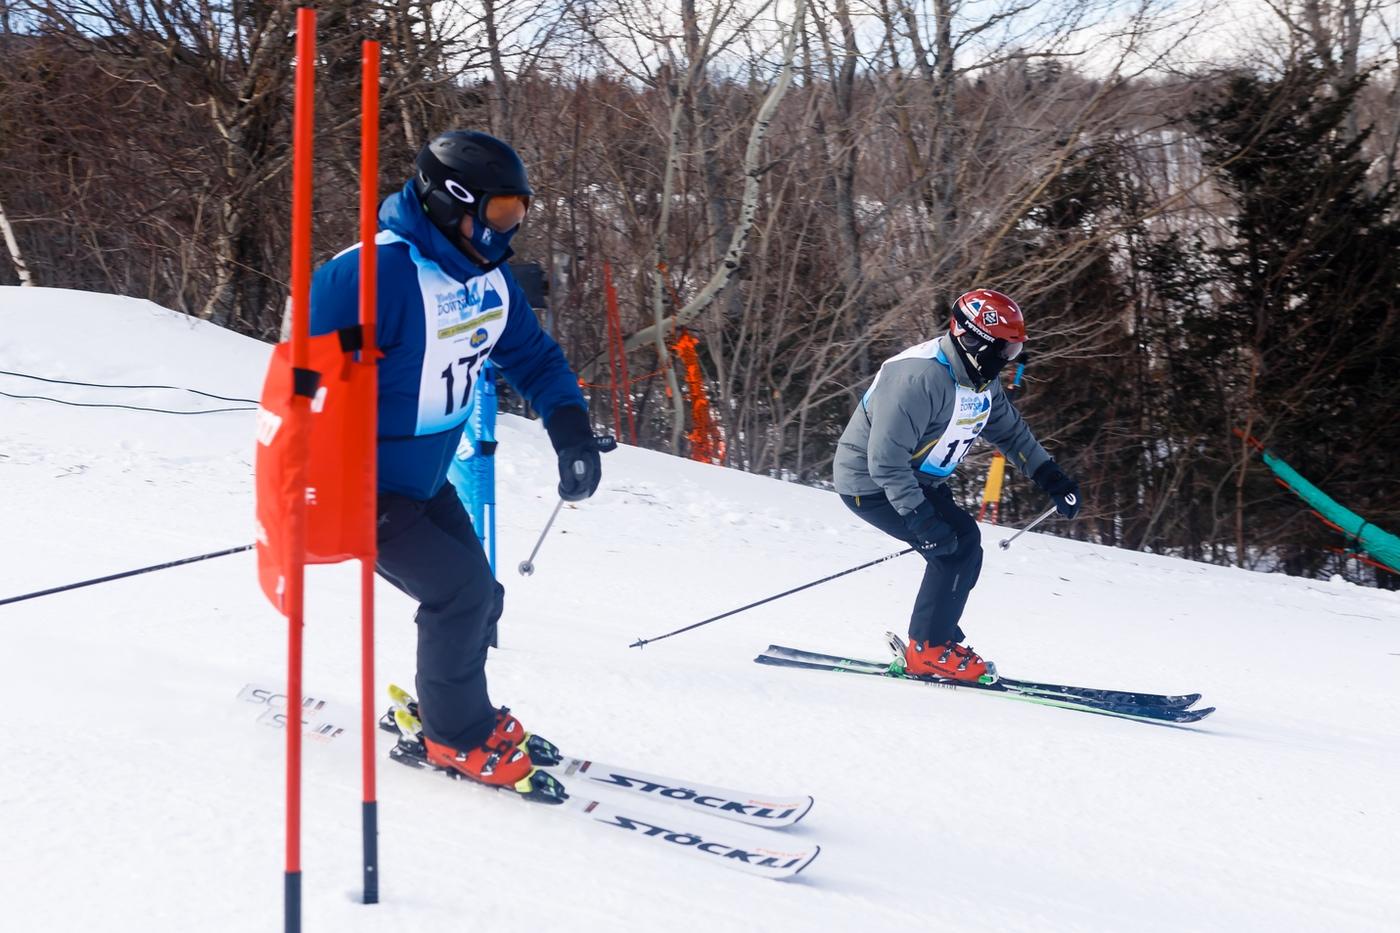 WinterKids Downhill 24 2021 SDP 3391